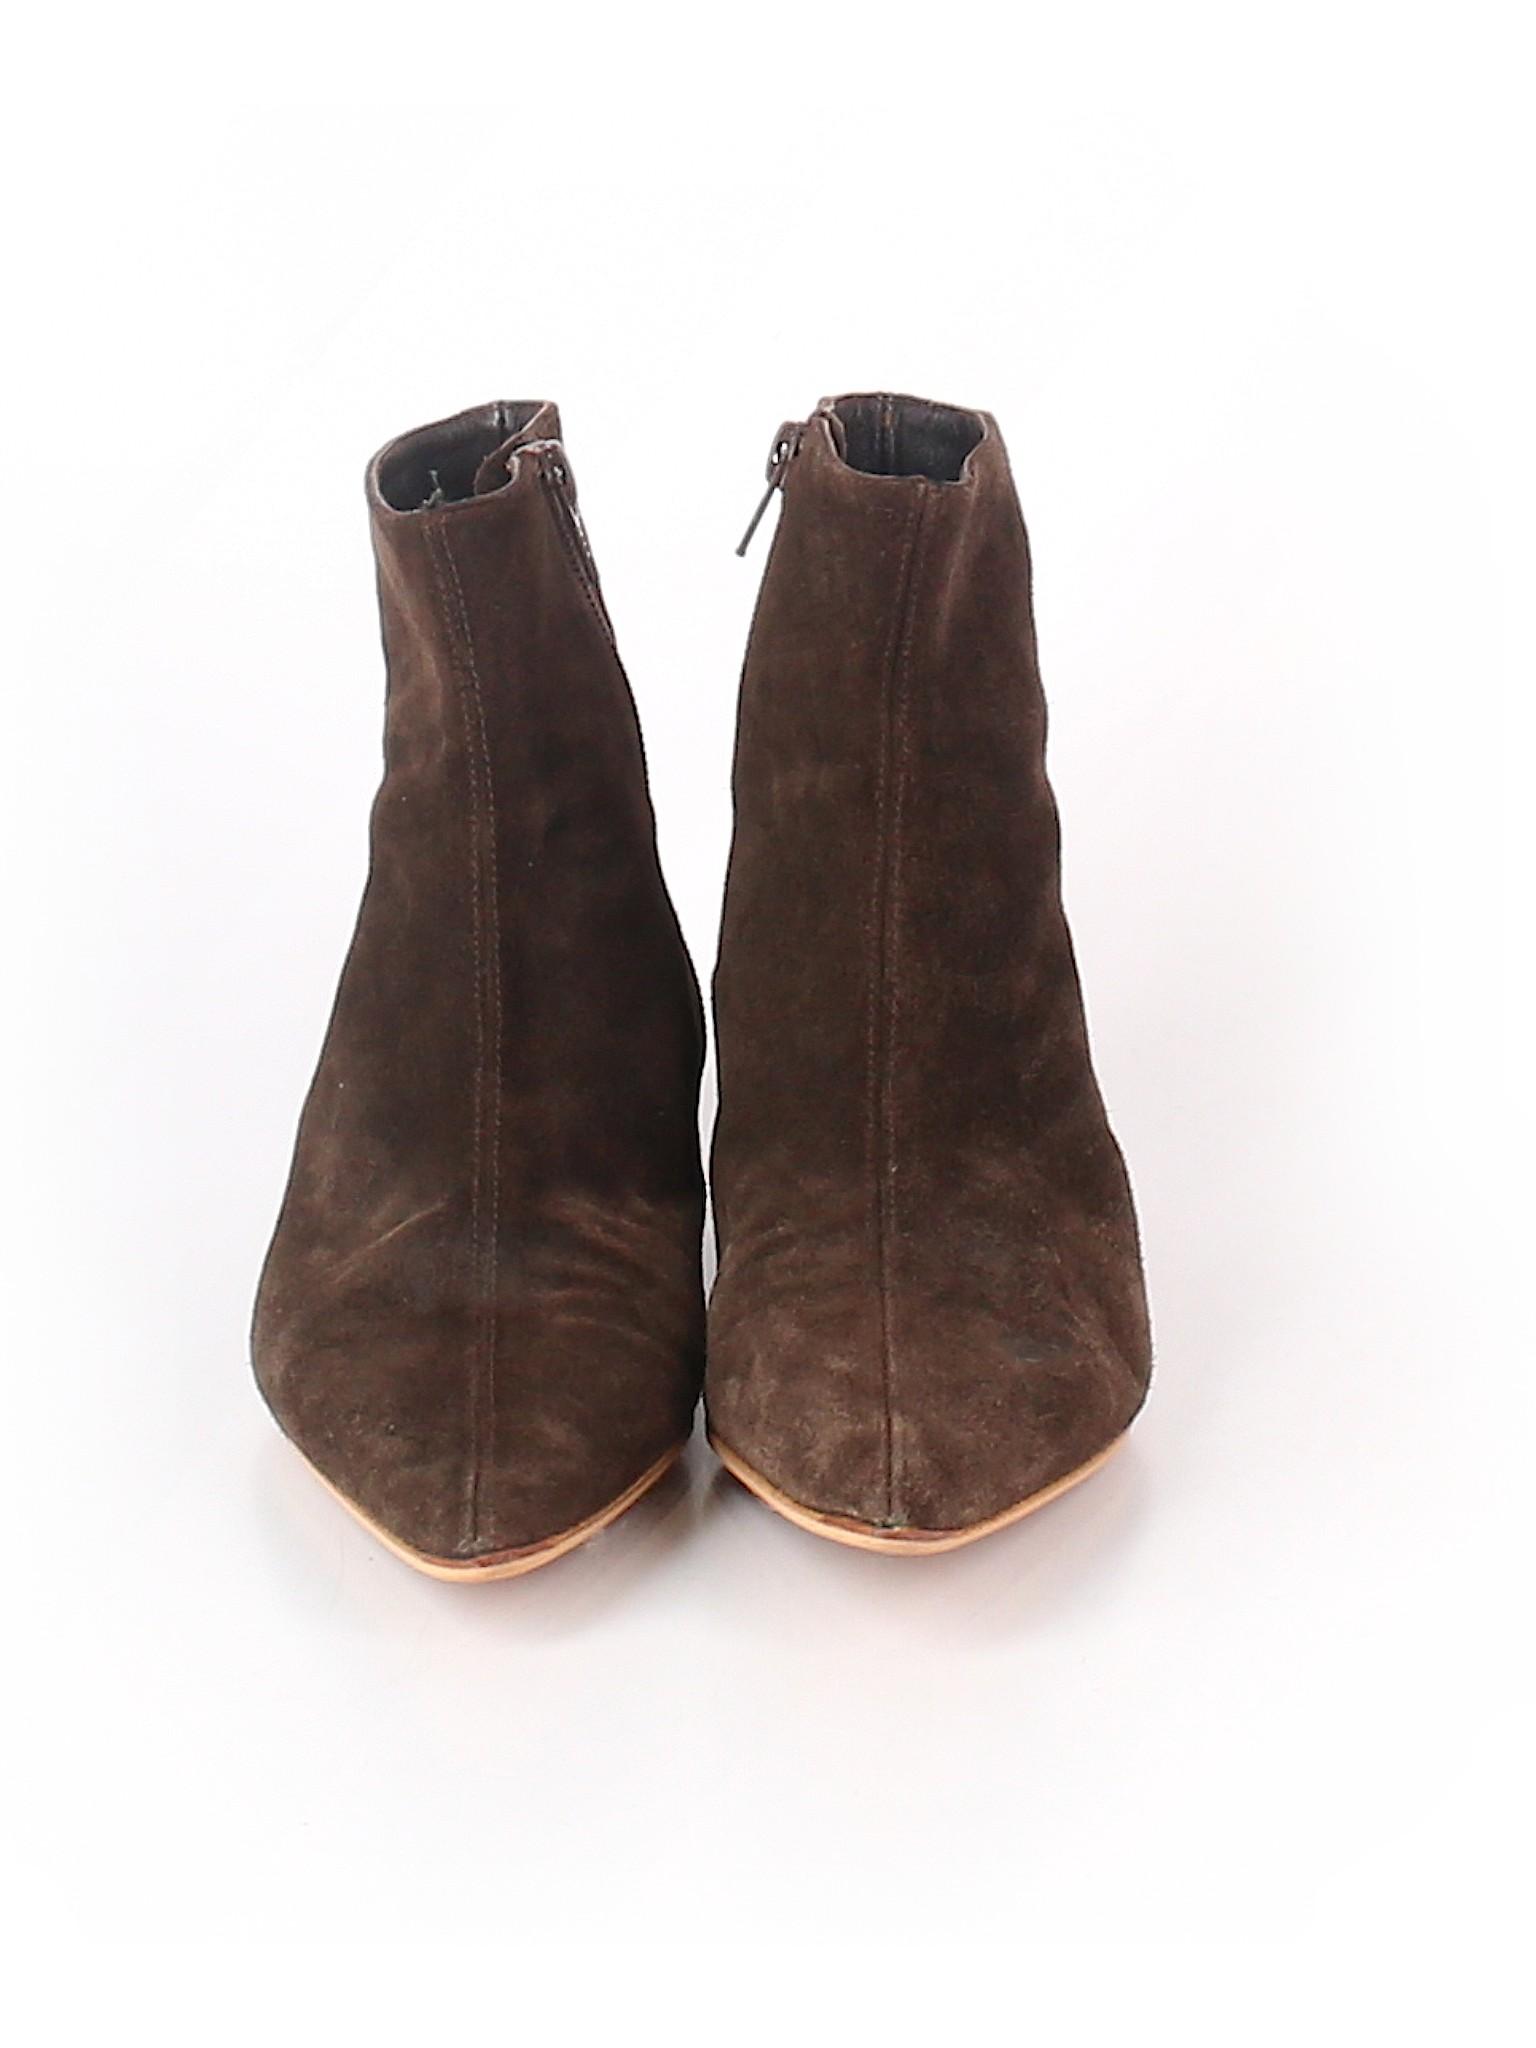 Ankle Boutique Republic Boots Banana promotion SwSqxBn0